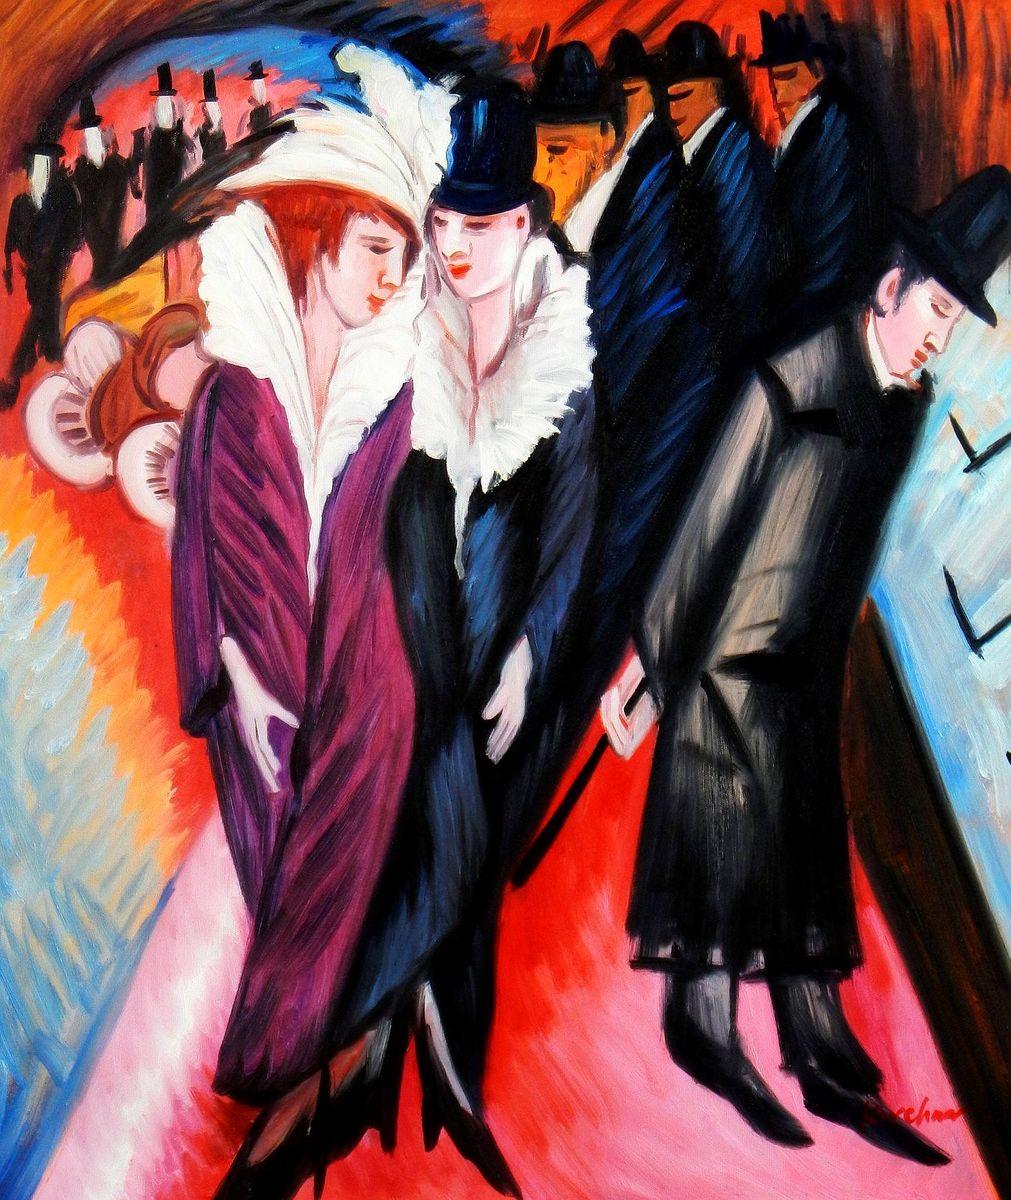 Ernst Ludwig Kirchner - Straßenszene Berlin c93656 G 50x60cm exquisites Ölbild